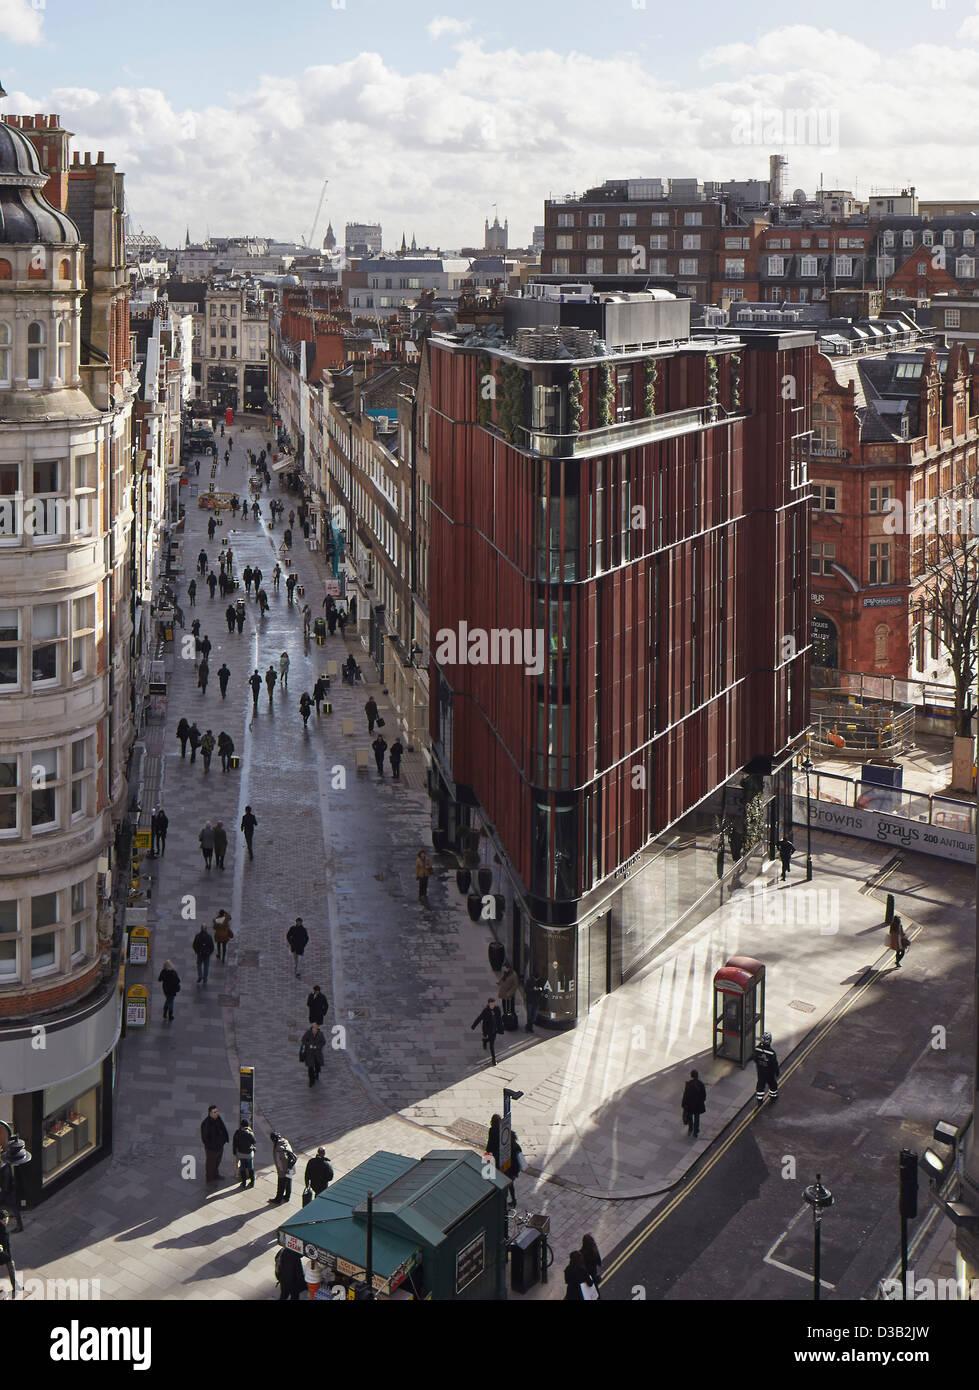 28 South Molton Street, London, United Kingdom. Architect: DSDHA, 2012. - Stock Image